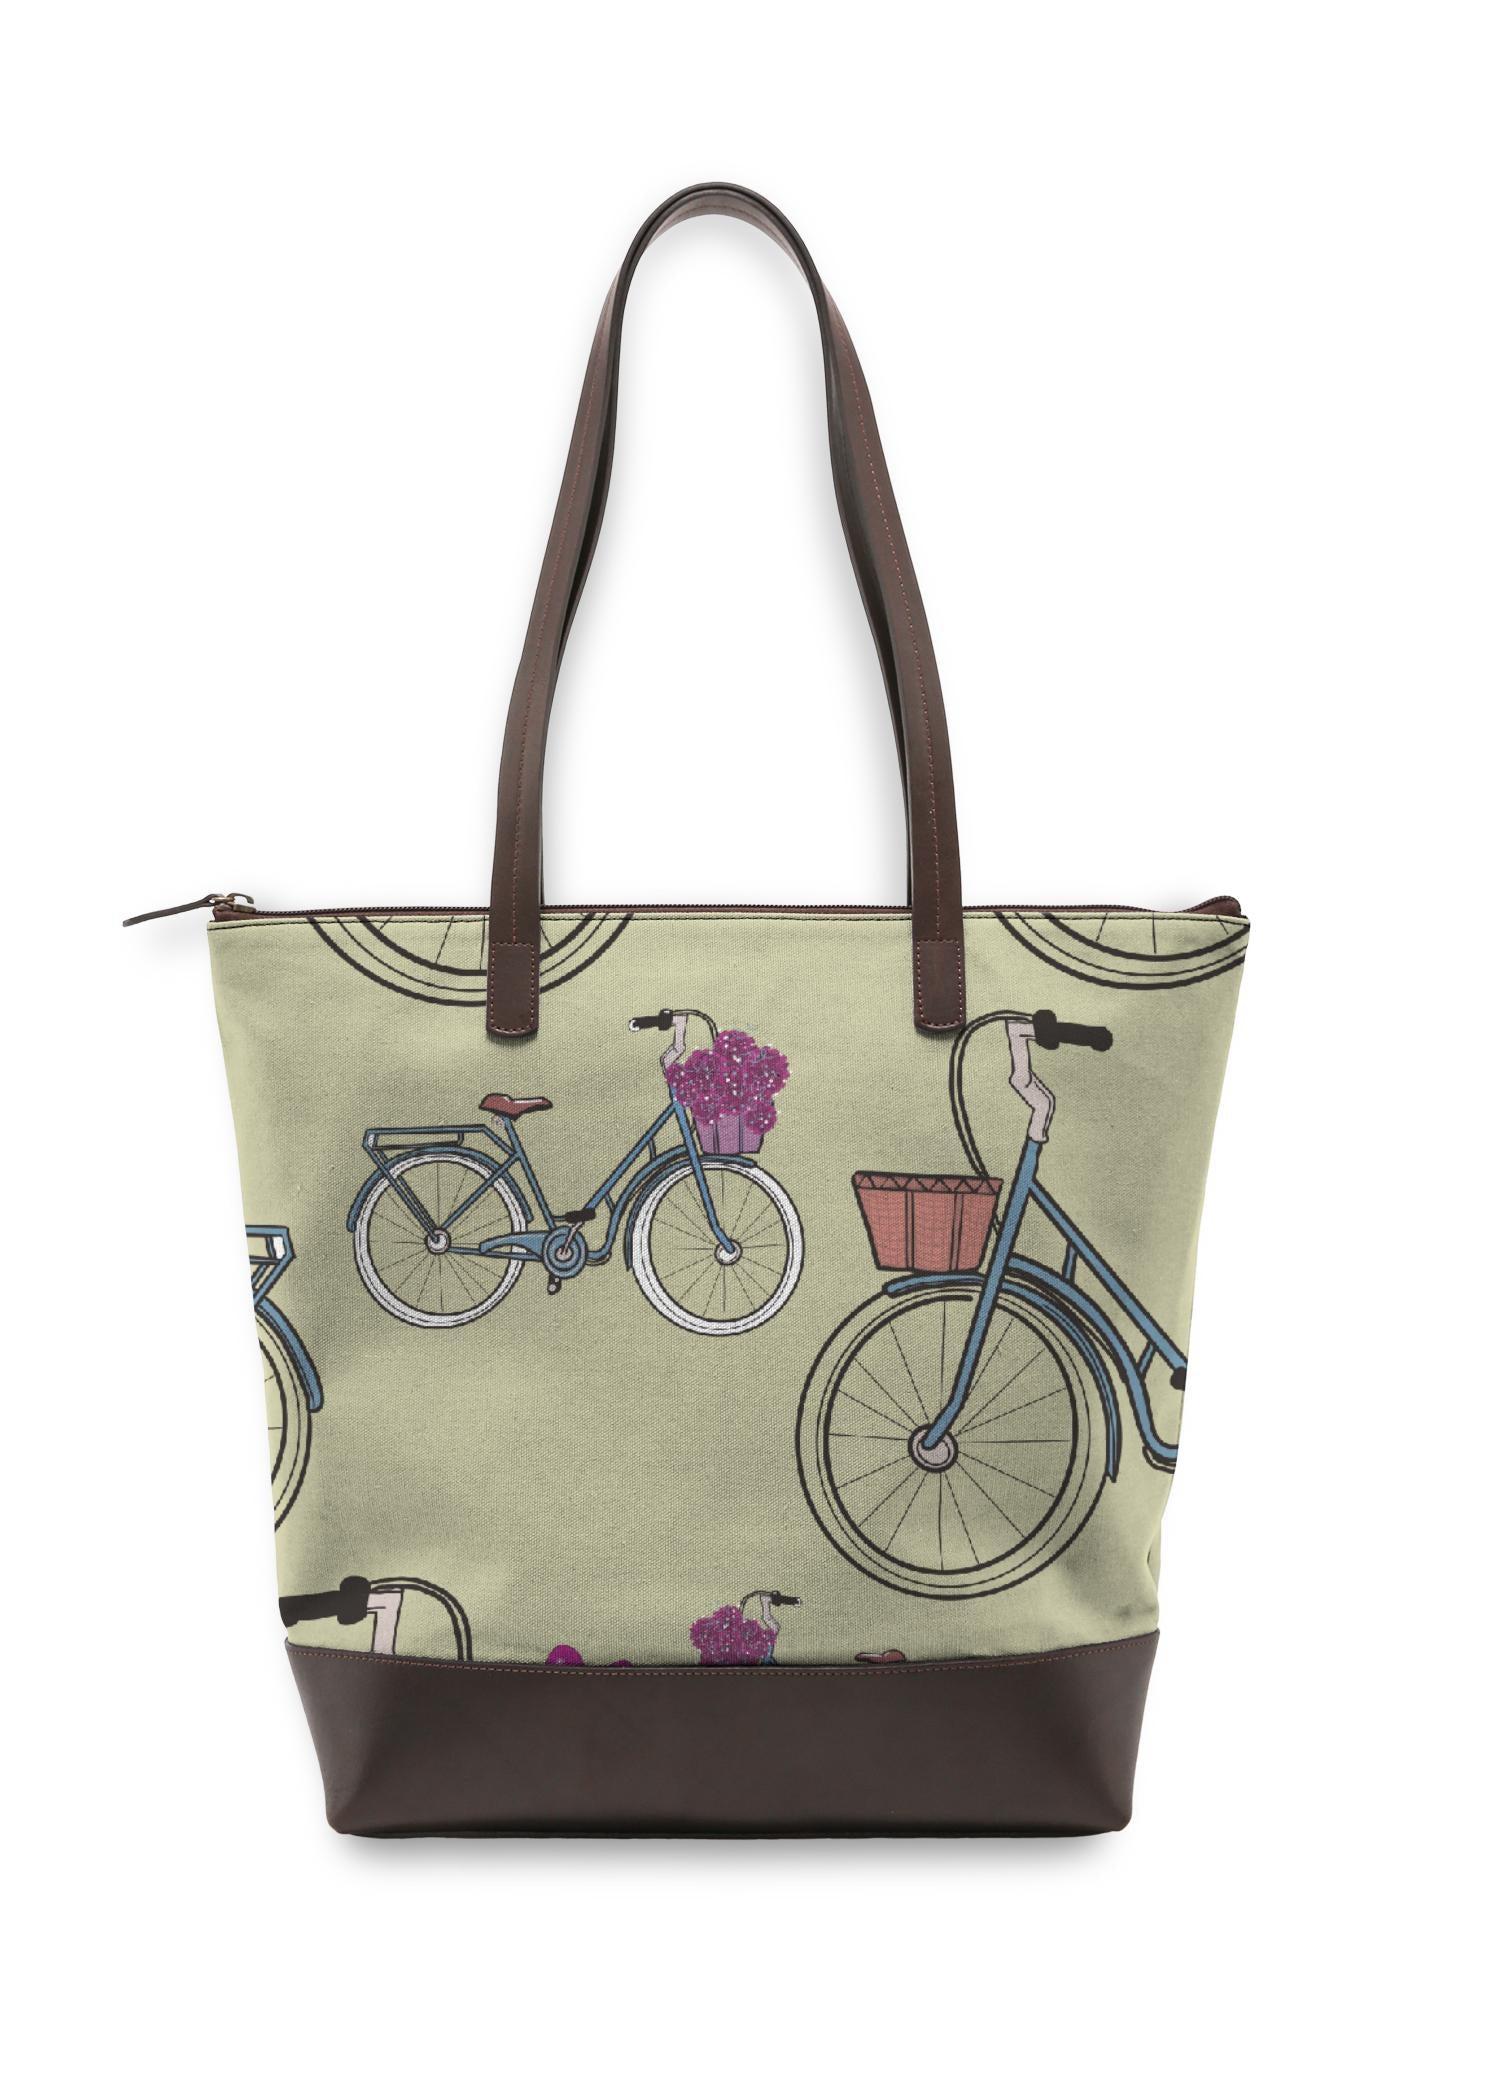 VIDA Statement Bag - Bike Day by VIDA Original Artist  - Size: One Size